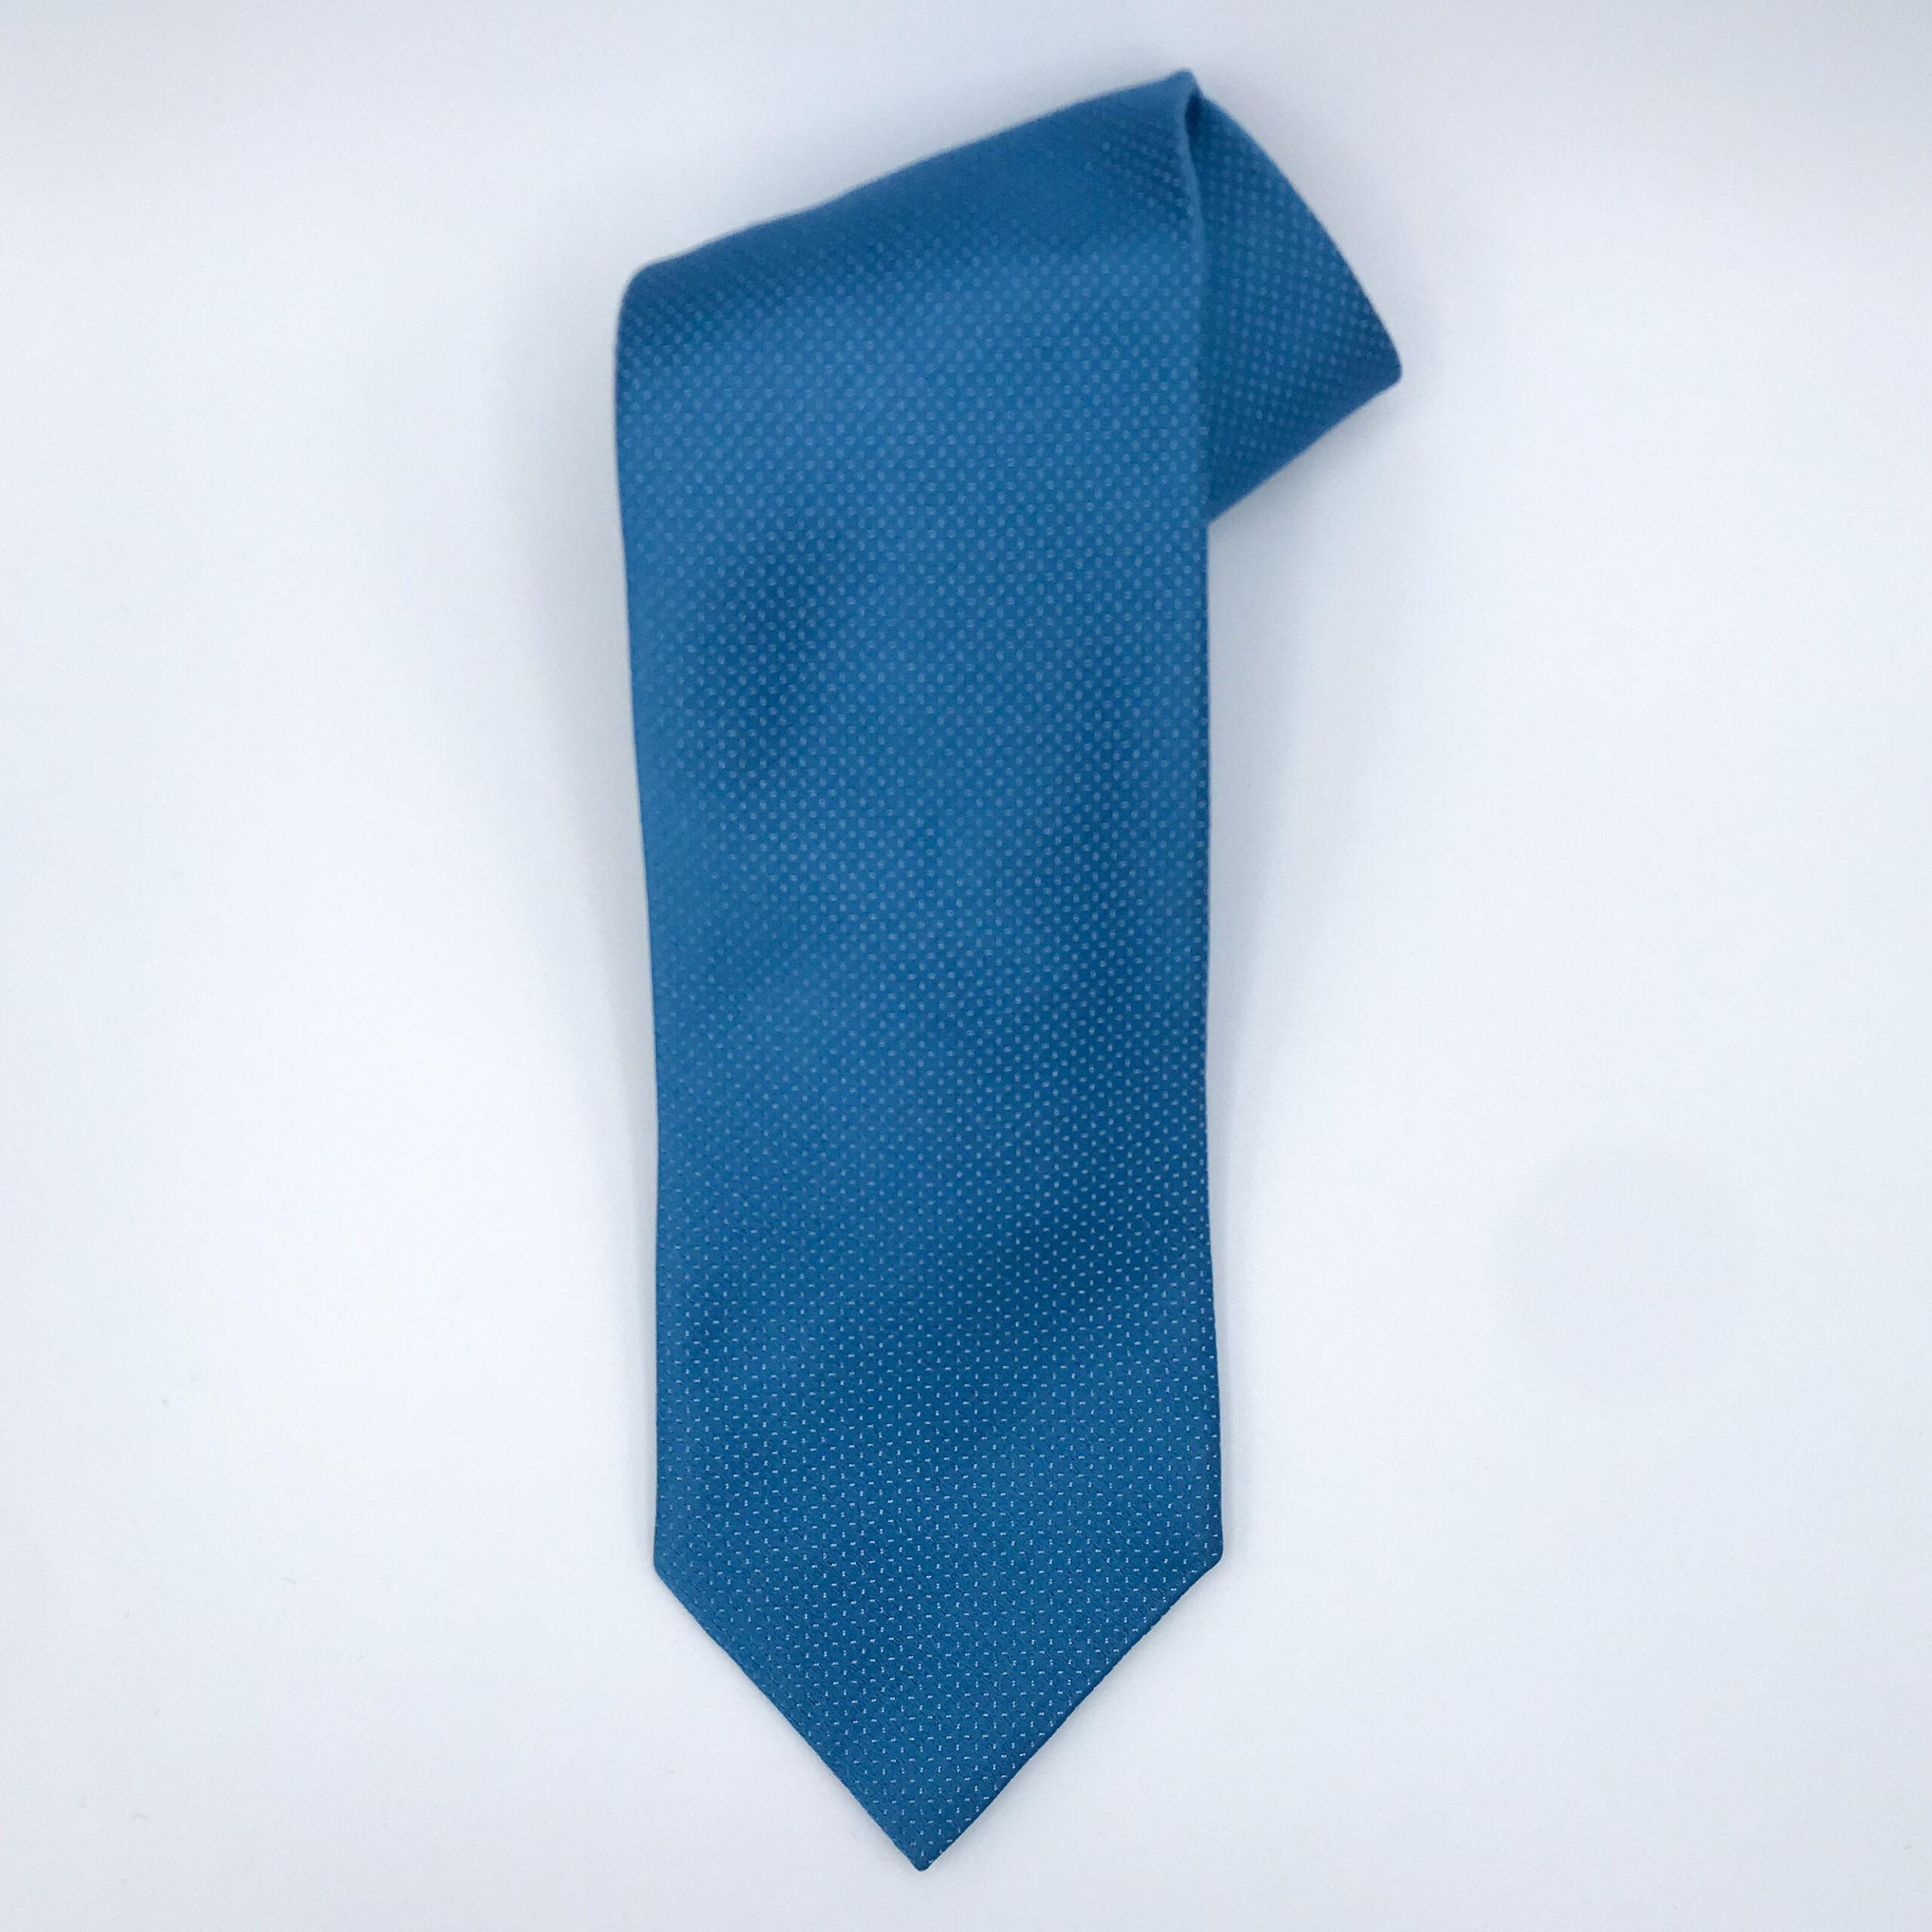 Blue Ermenegildo Zegna Tie